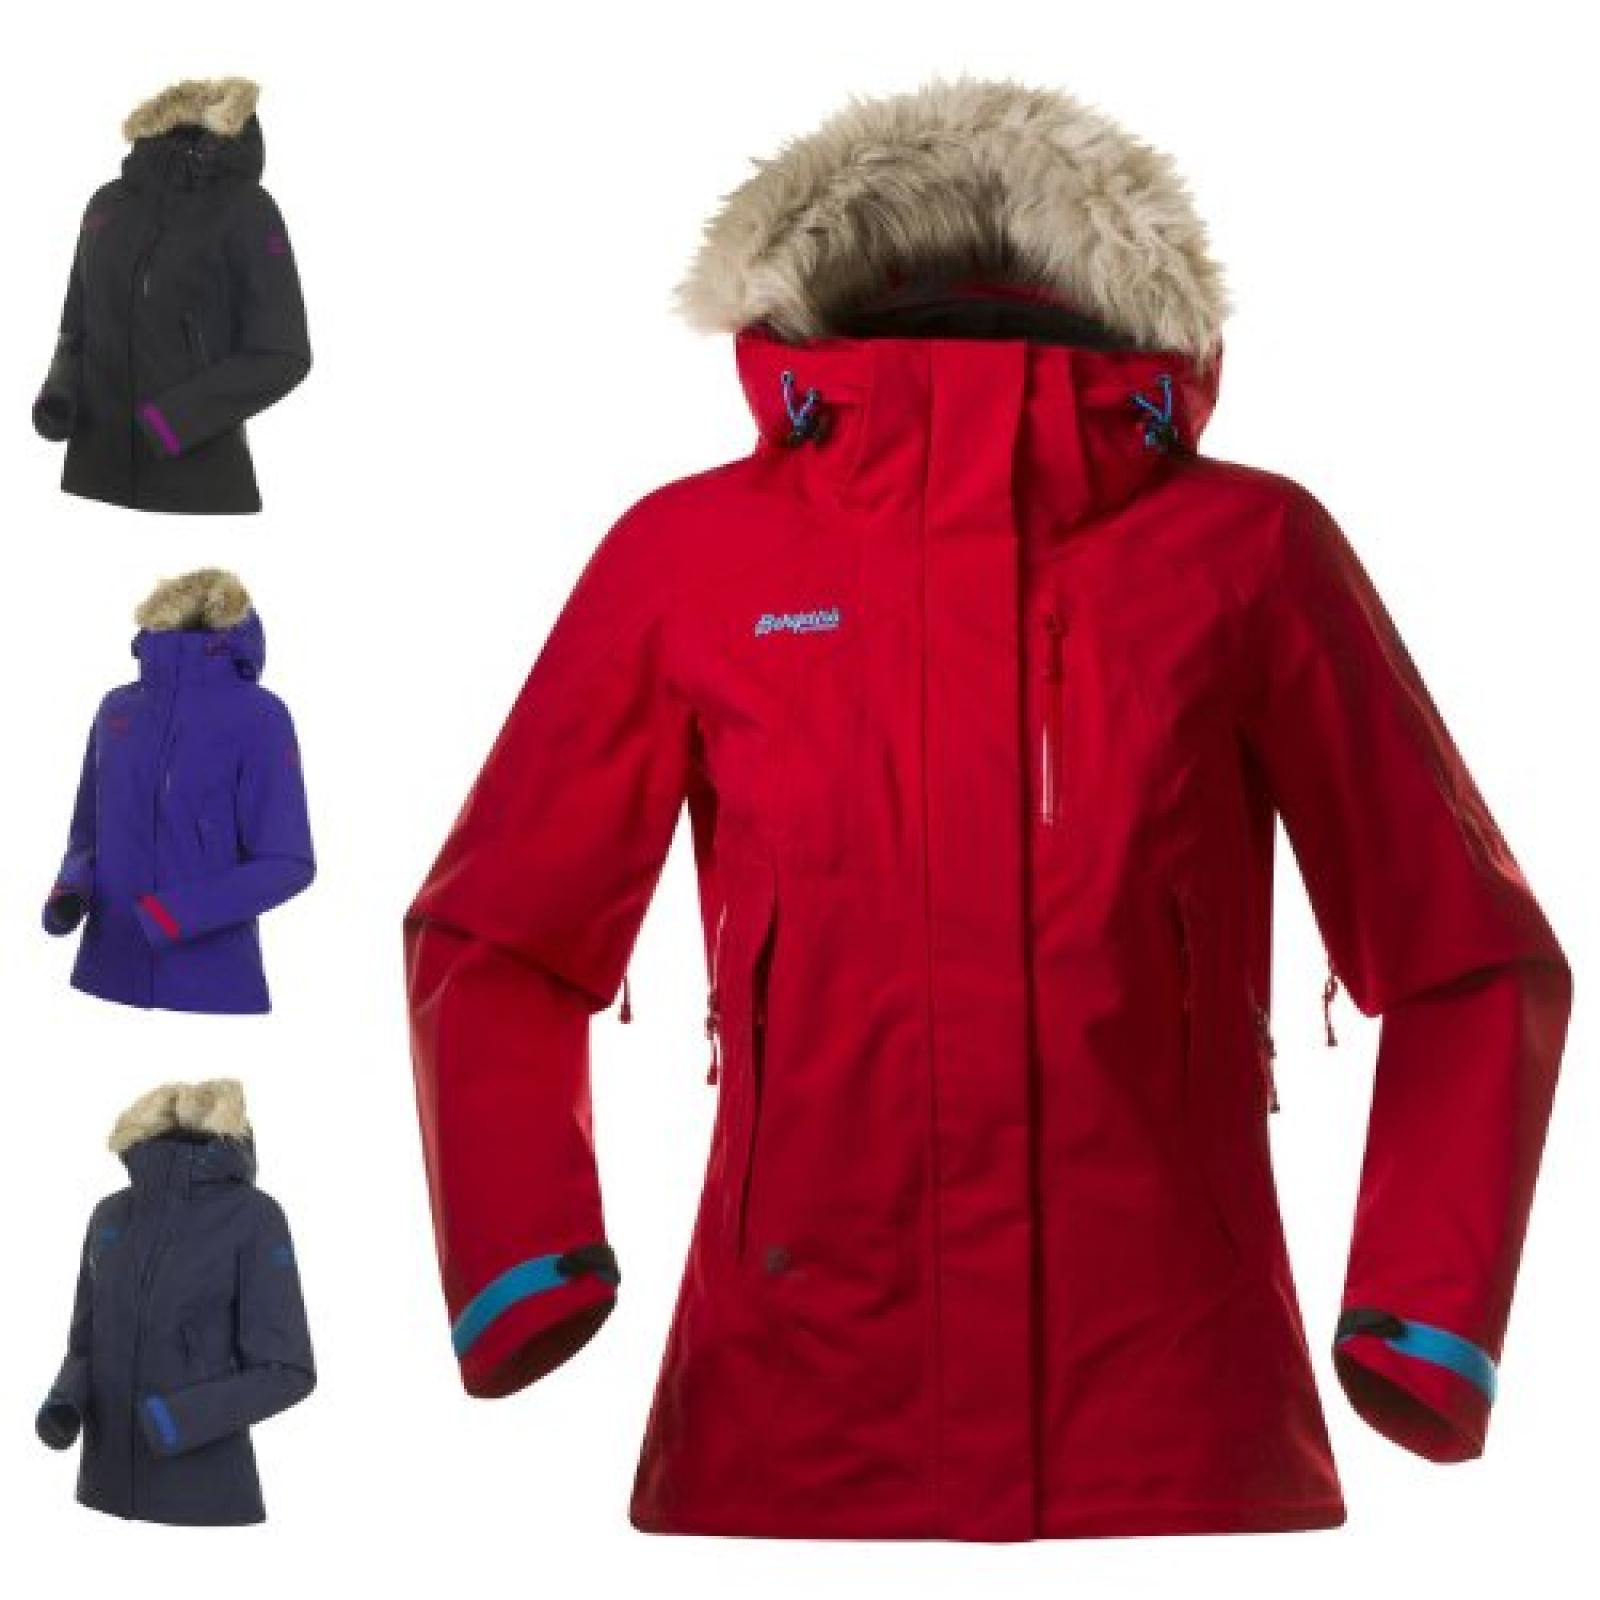 Damen Snowboard Jacke Bergans Nordkapp Jacket